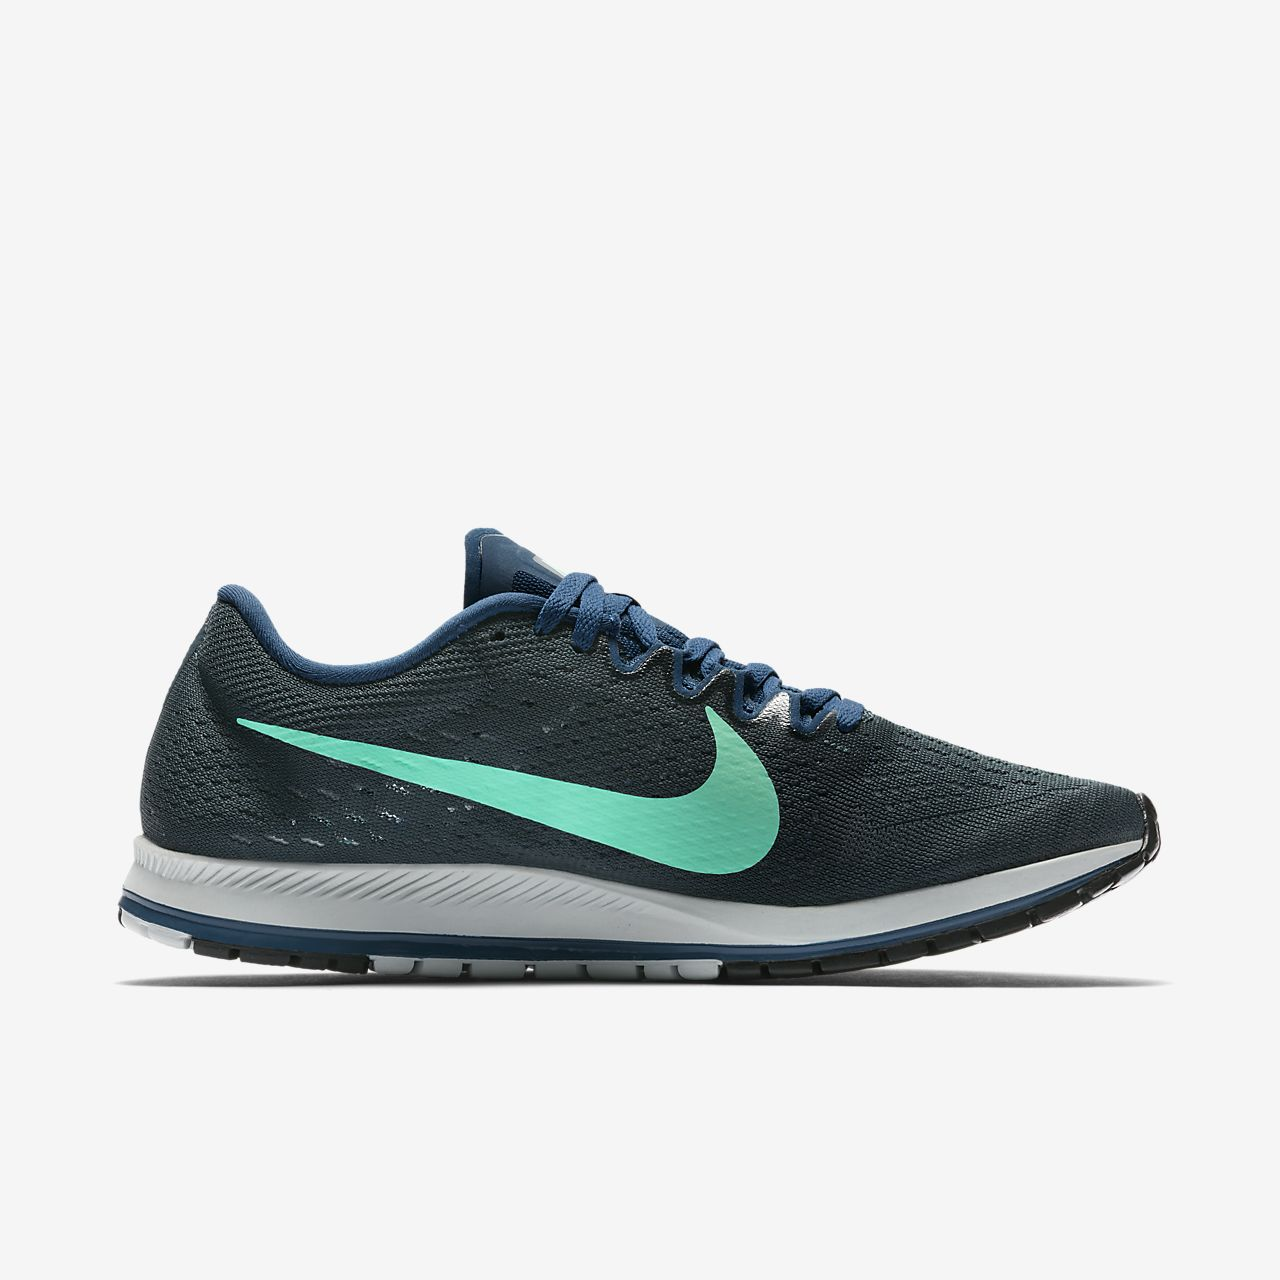 Nike Zoom Span Run Fast Schuhe Gr.43 A1 Zustand